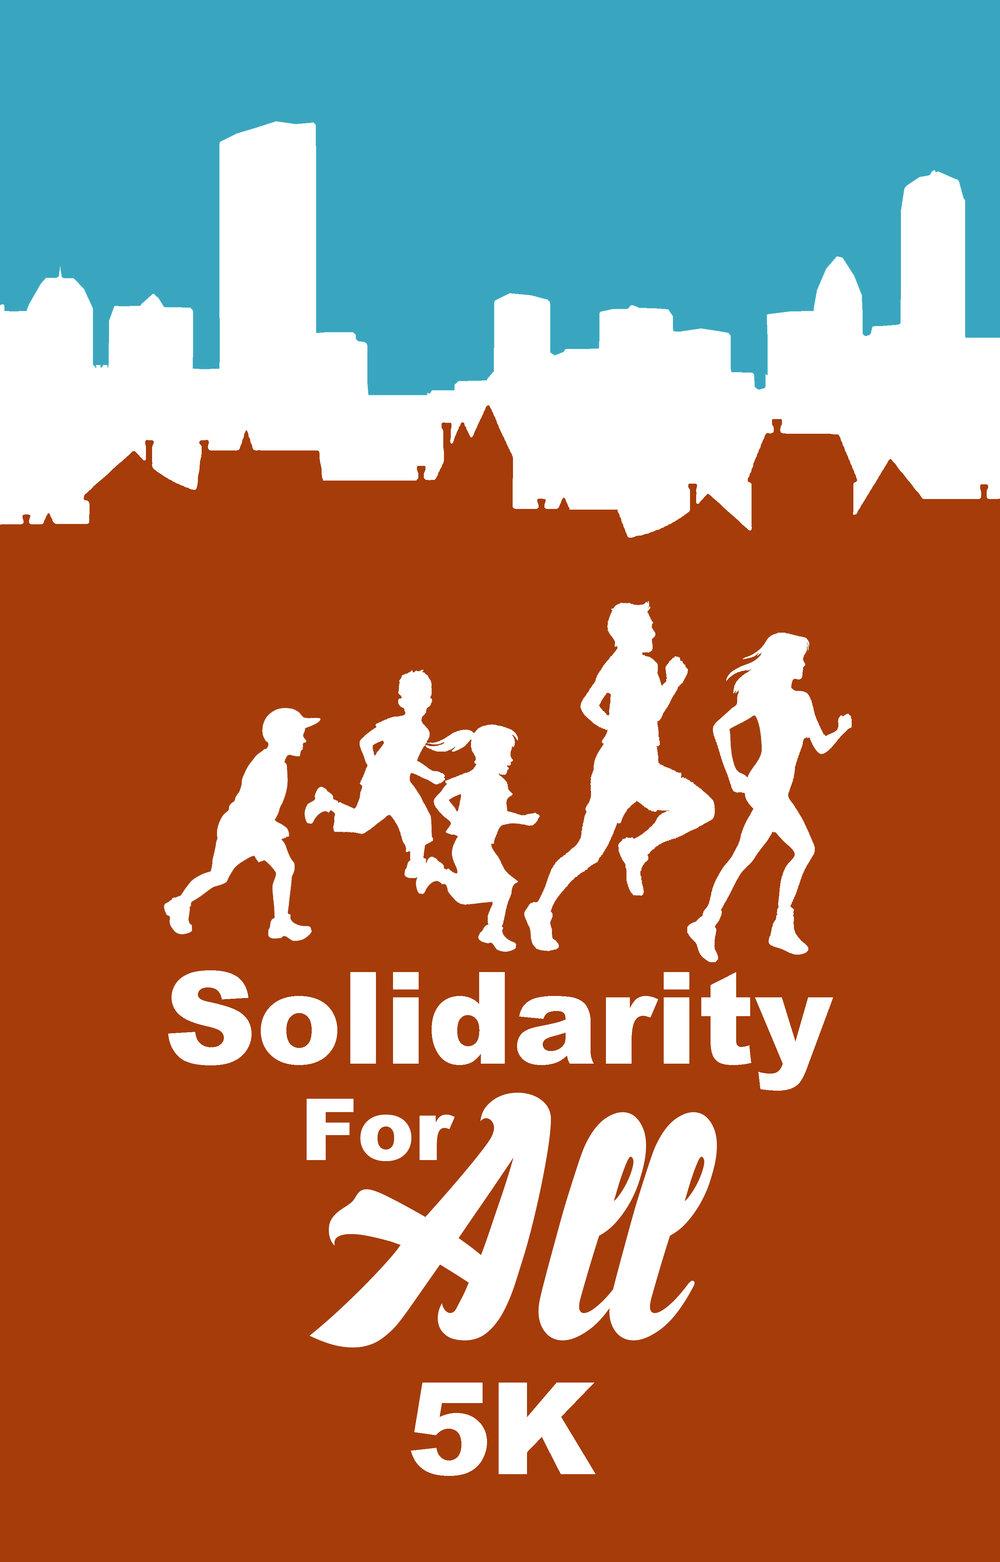 SolidarityForAllLogoBlue.jpg